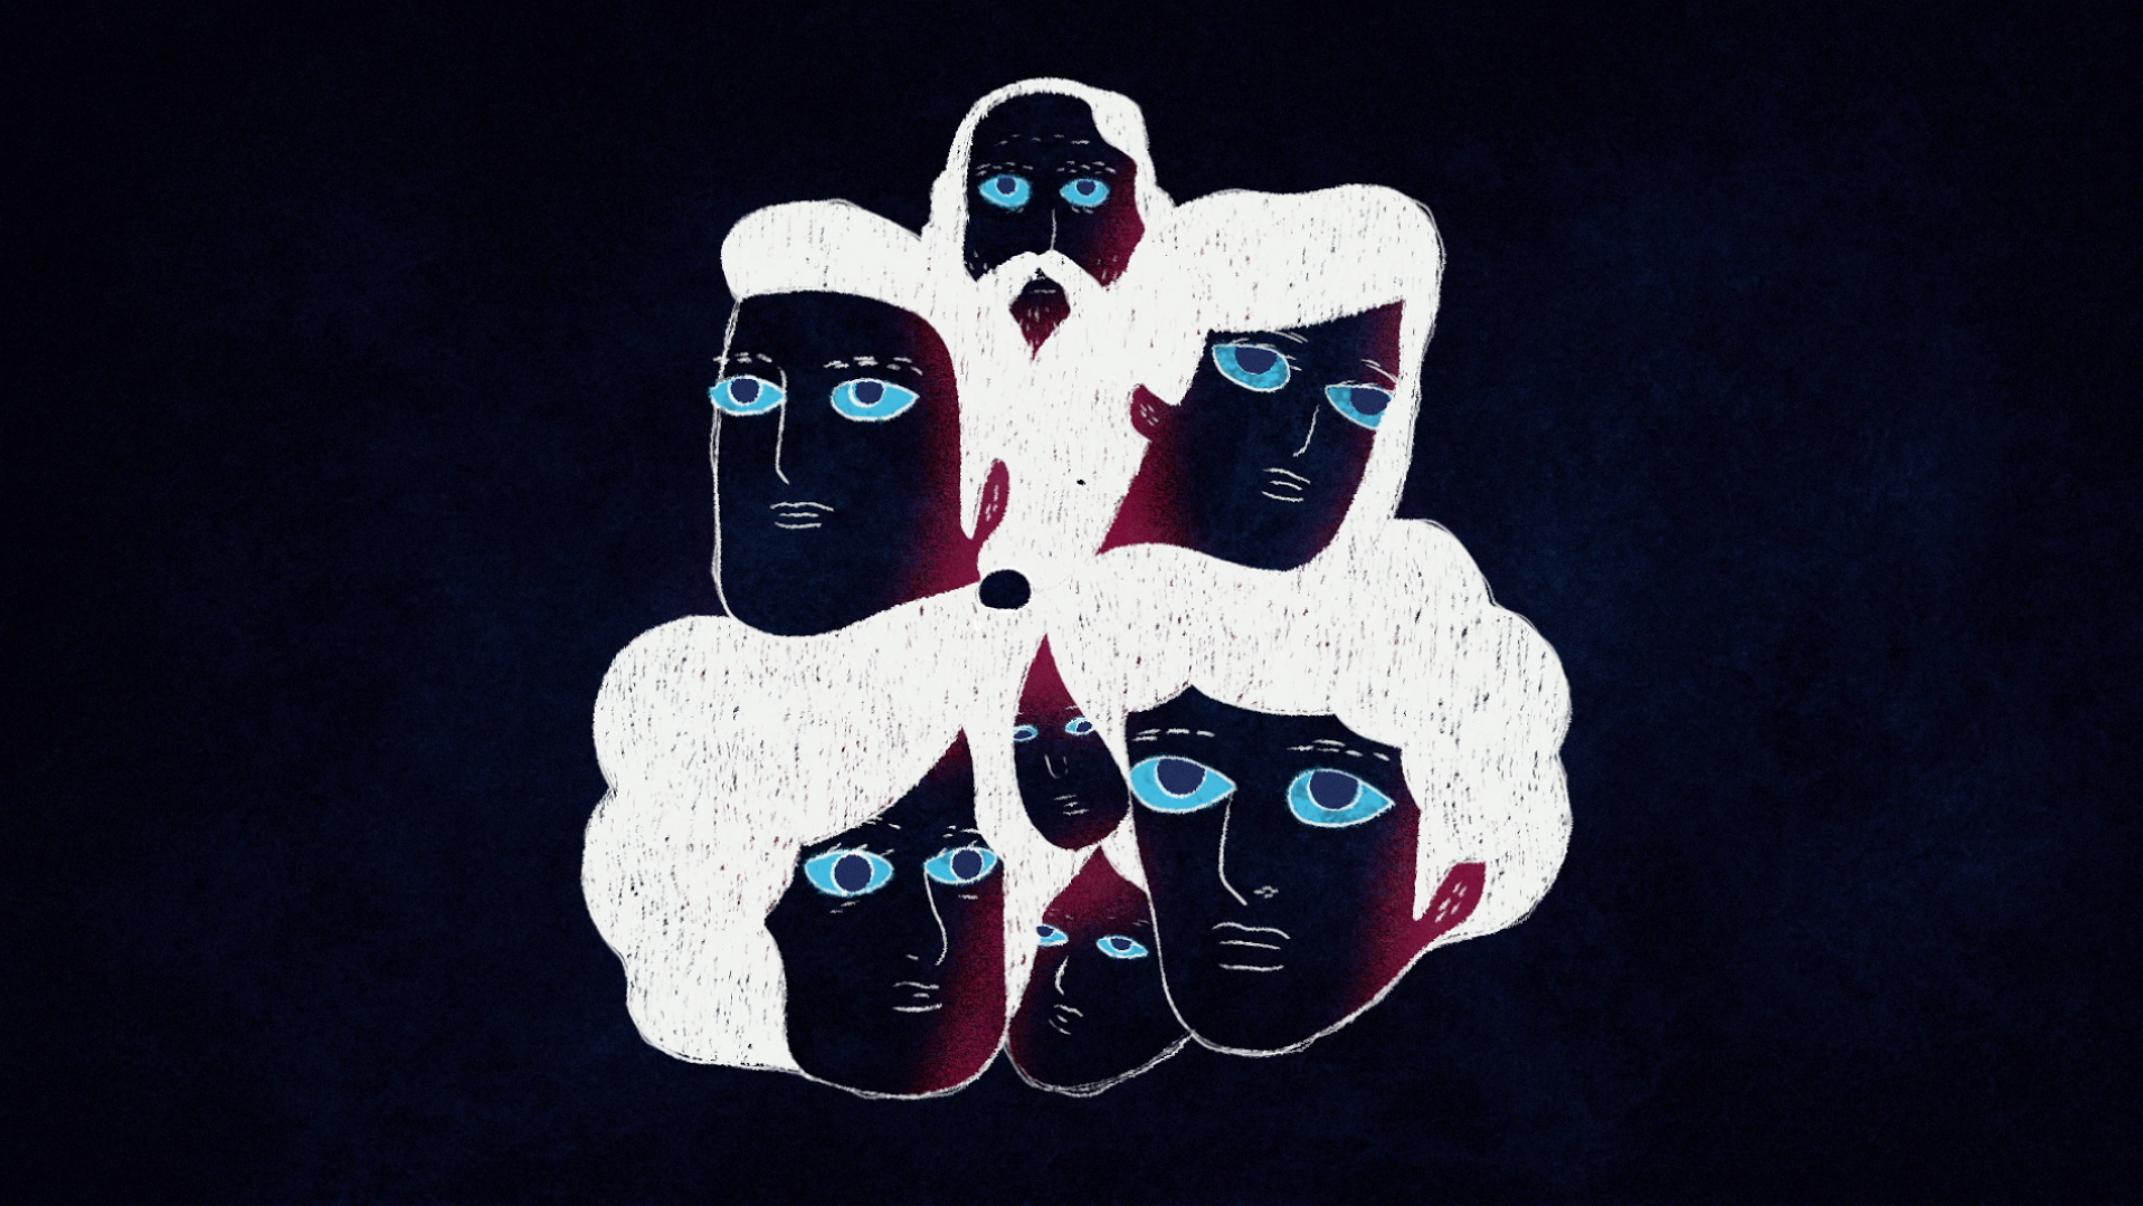 heads composition white hair blue eyes illustration hand drawn animation telecine estudio beeld rio